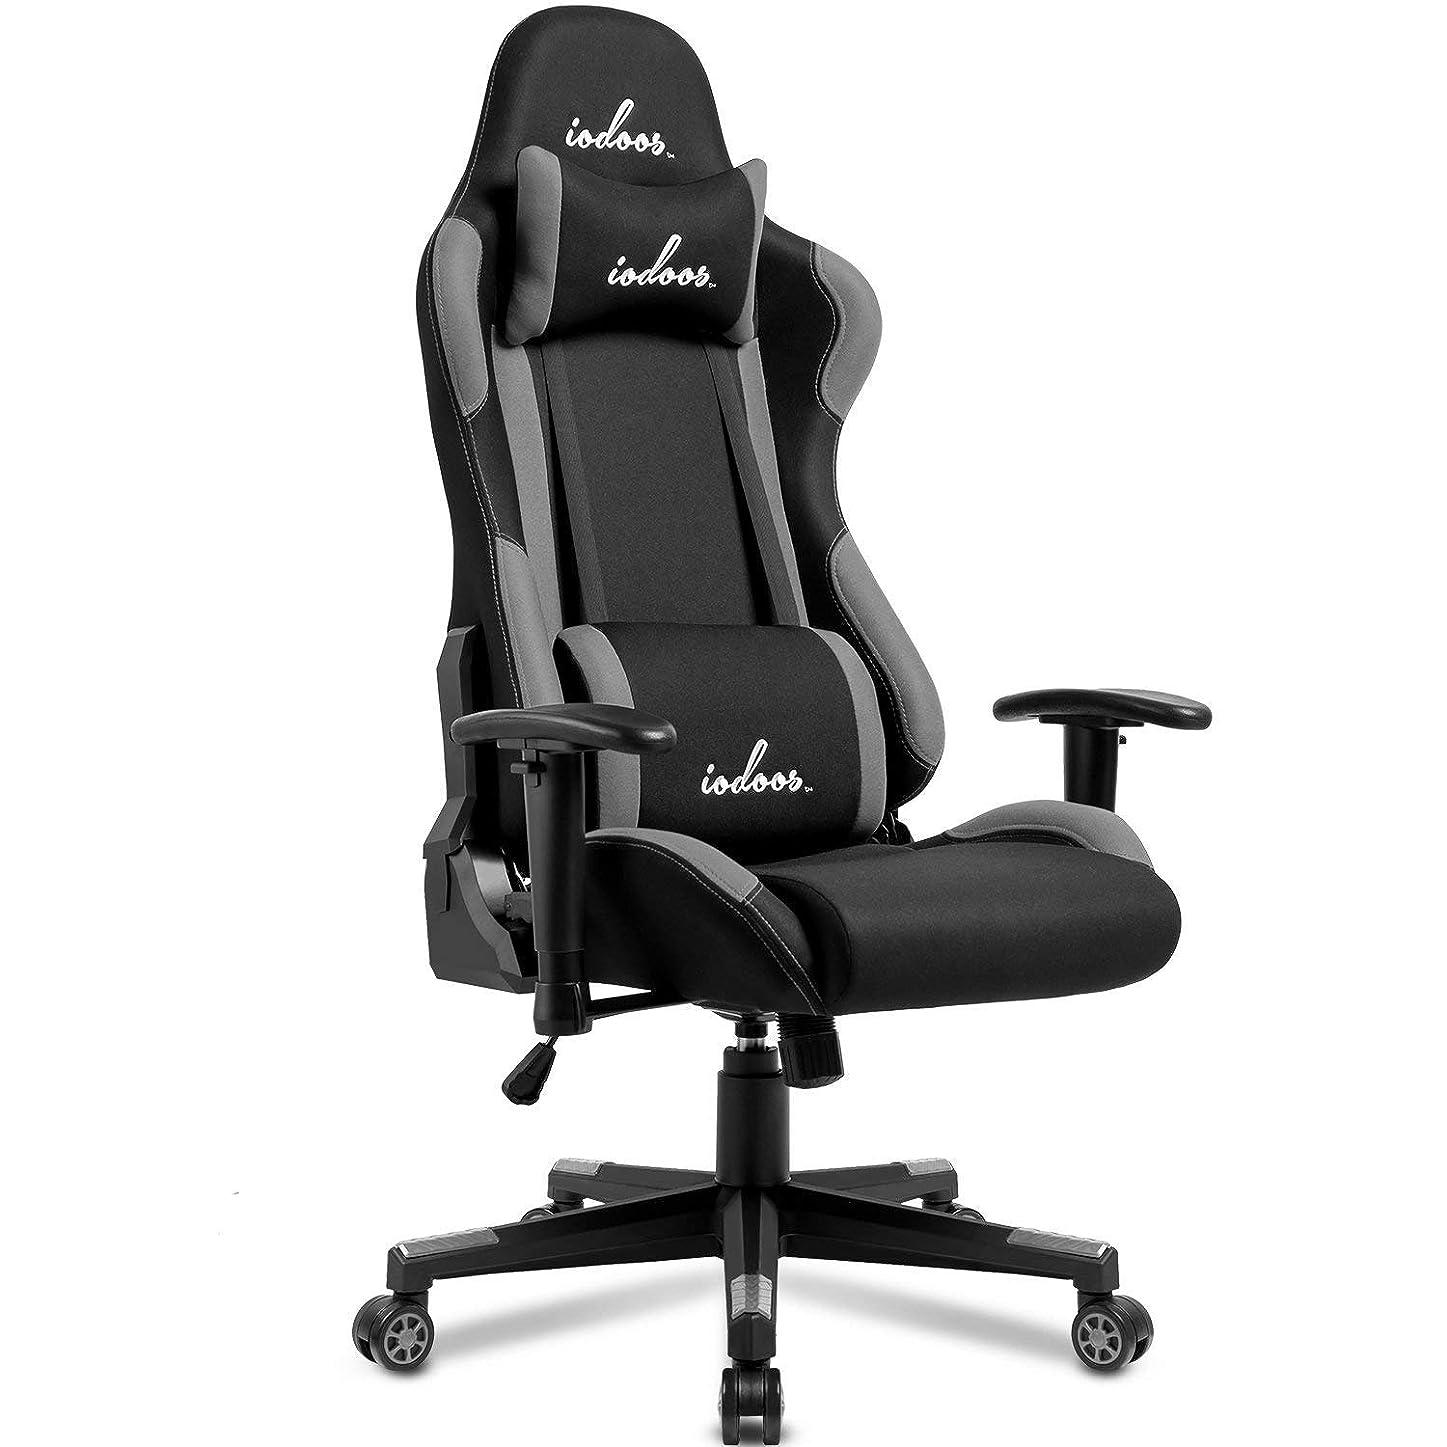 IODOOS ゲーミングチェア 布地 gaming chair パソコンチェア 上下昇降 180度リクライニング ランバーサポート付き 肘掛付き 通気性抜群 (Grey) 01CAA